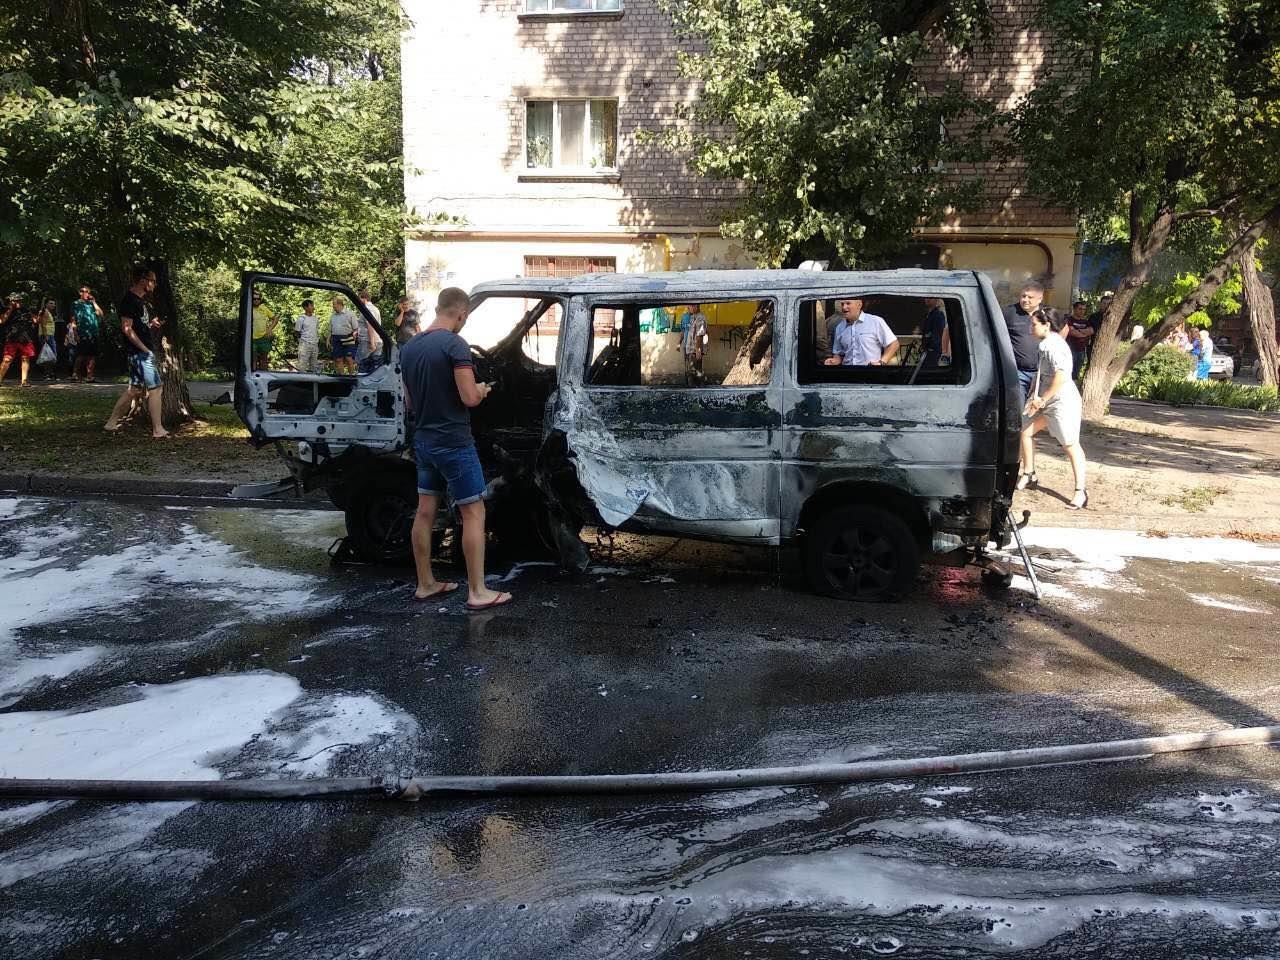 В Днепропетровской области взорвали машину: внутри находился депутат горсовета, - ФОТО, фото-5